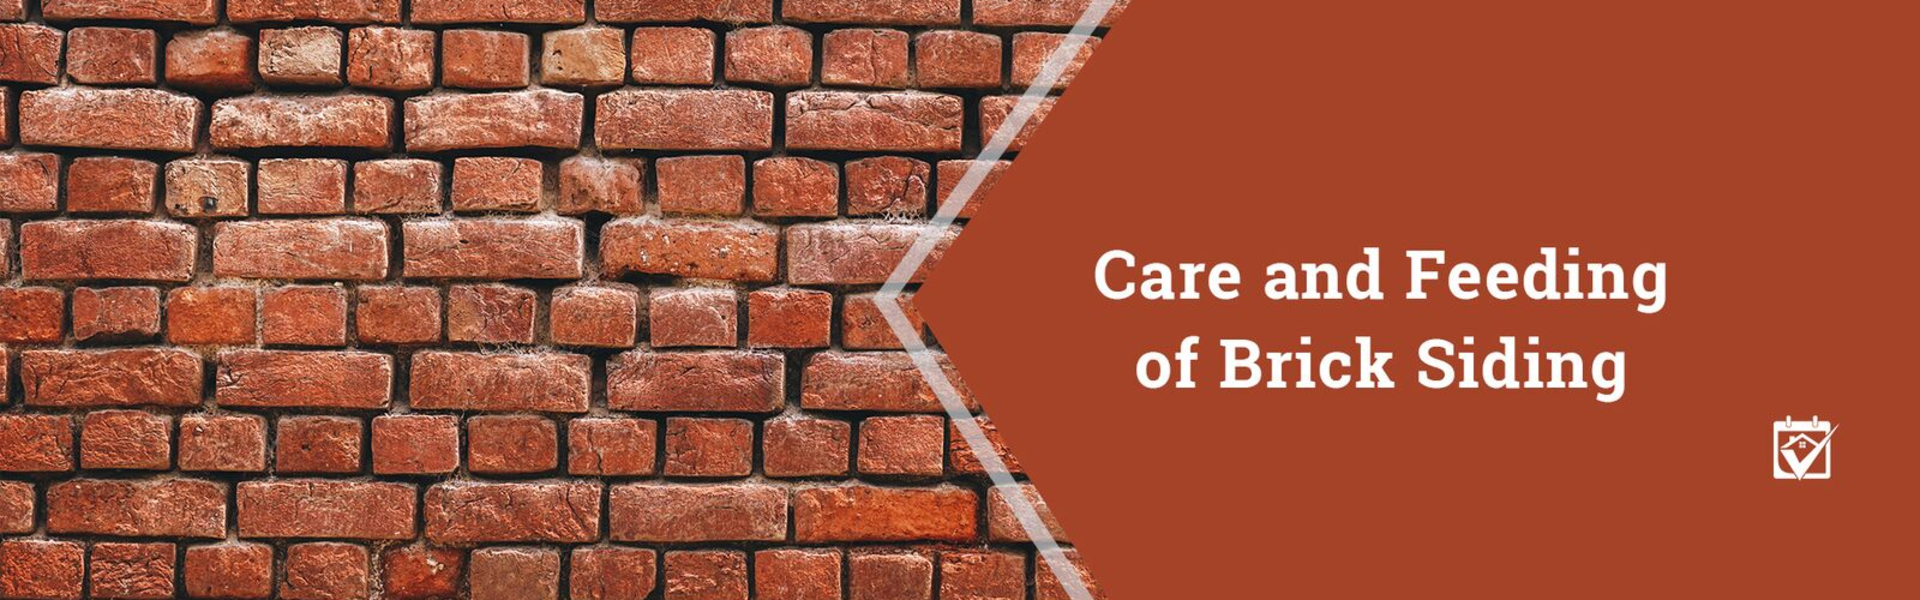 Care and Feeding of Brick Siding